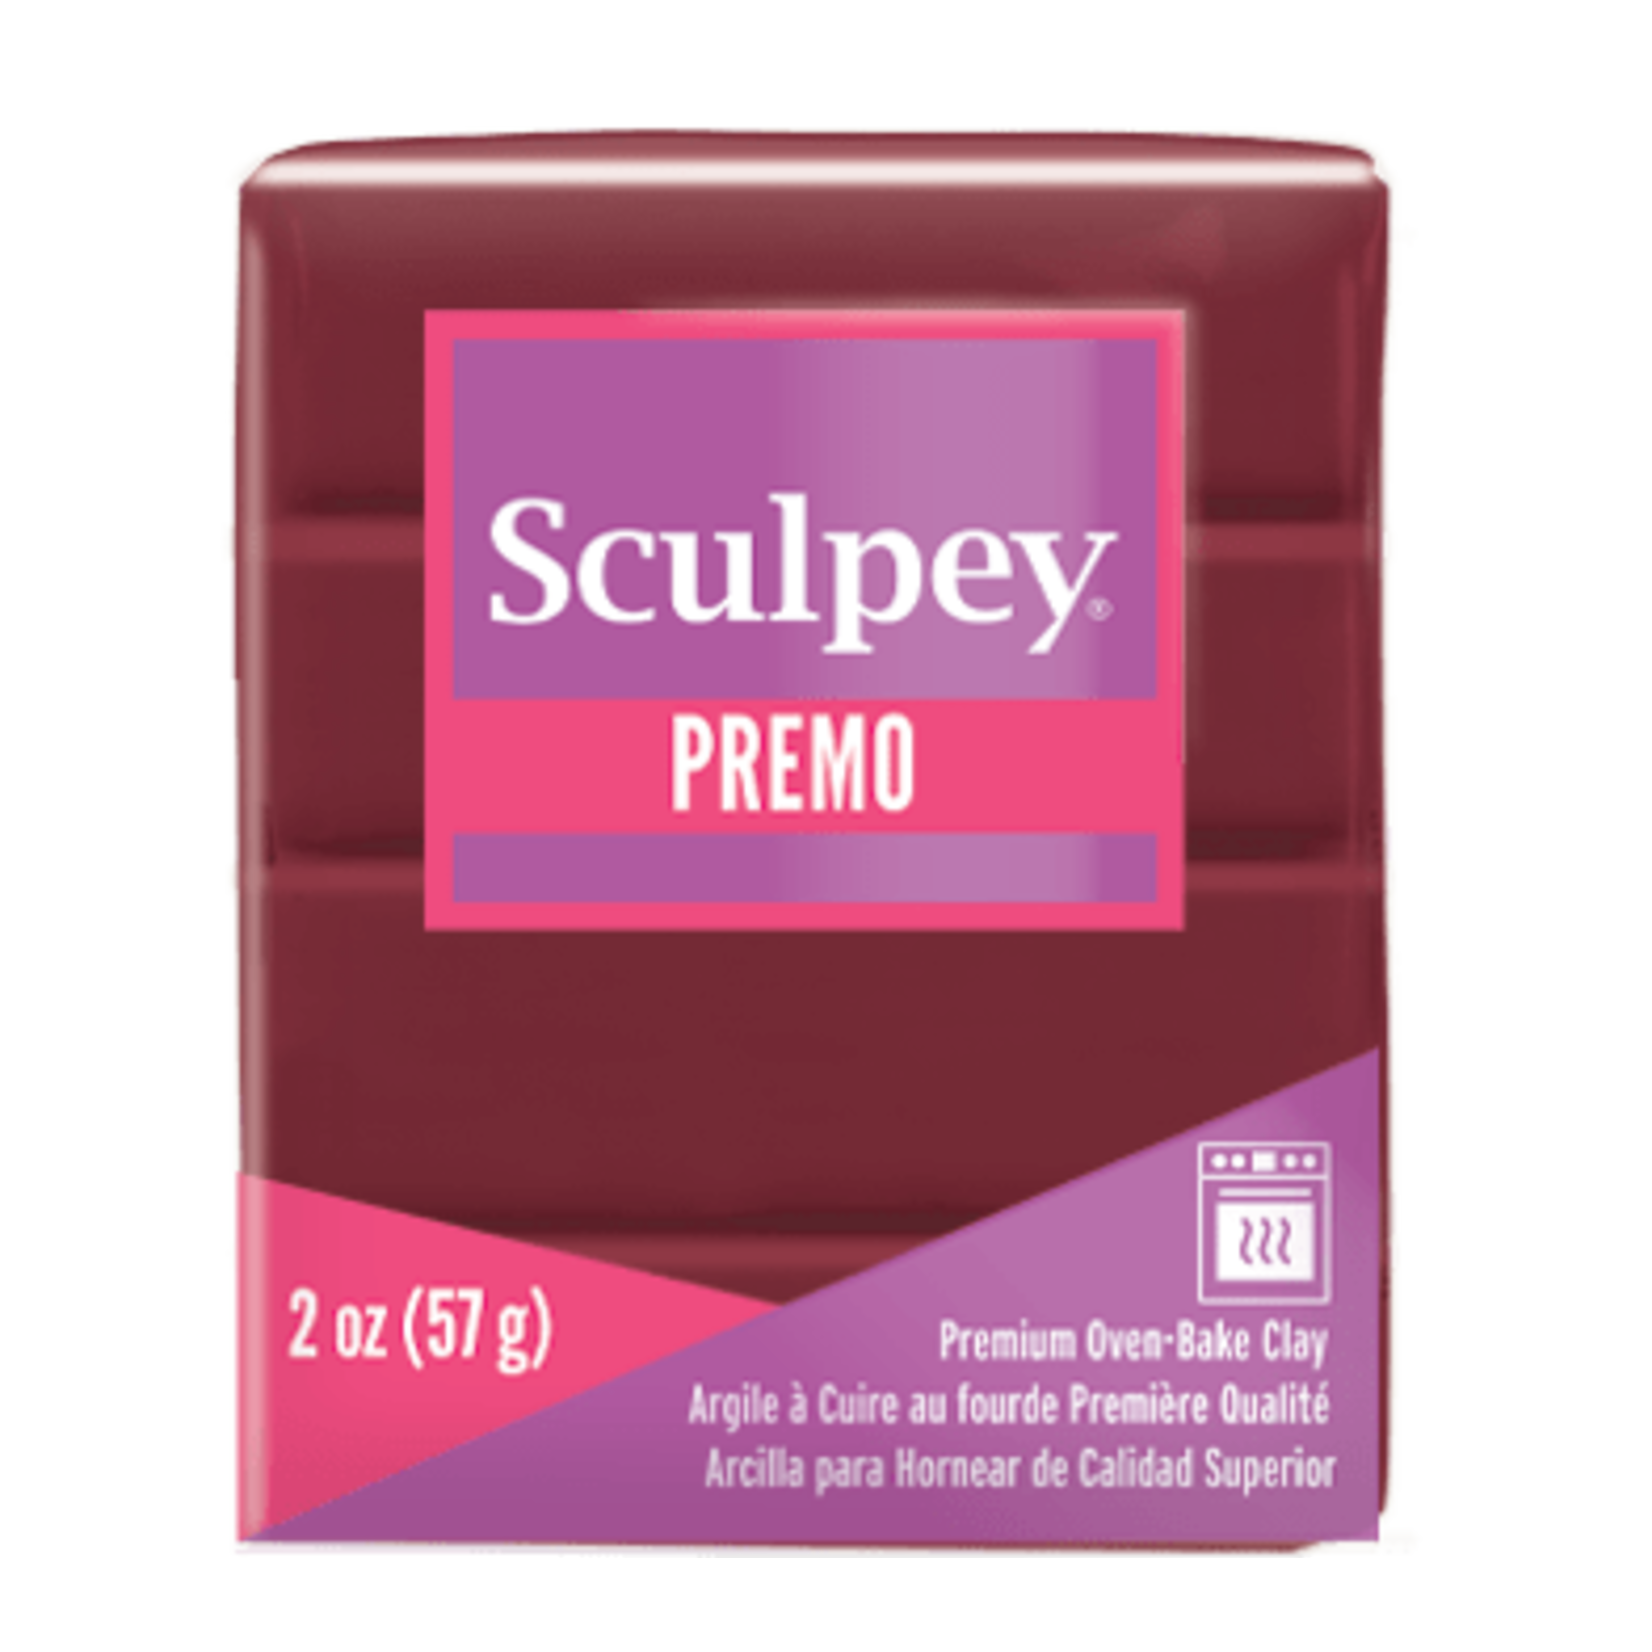 Sculpey Sculpey Premo  -- Alizarin Crimson Hue